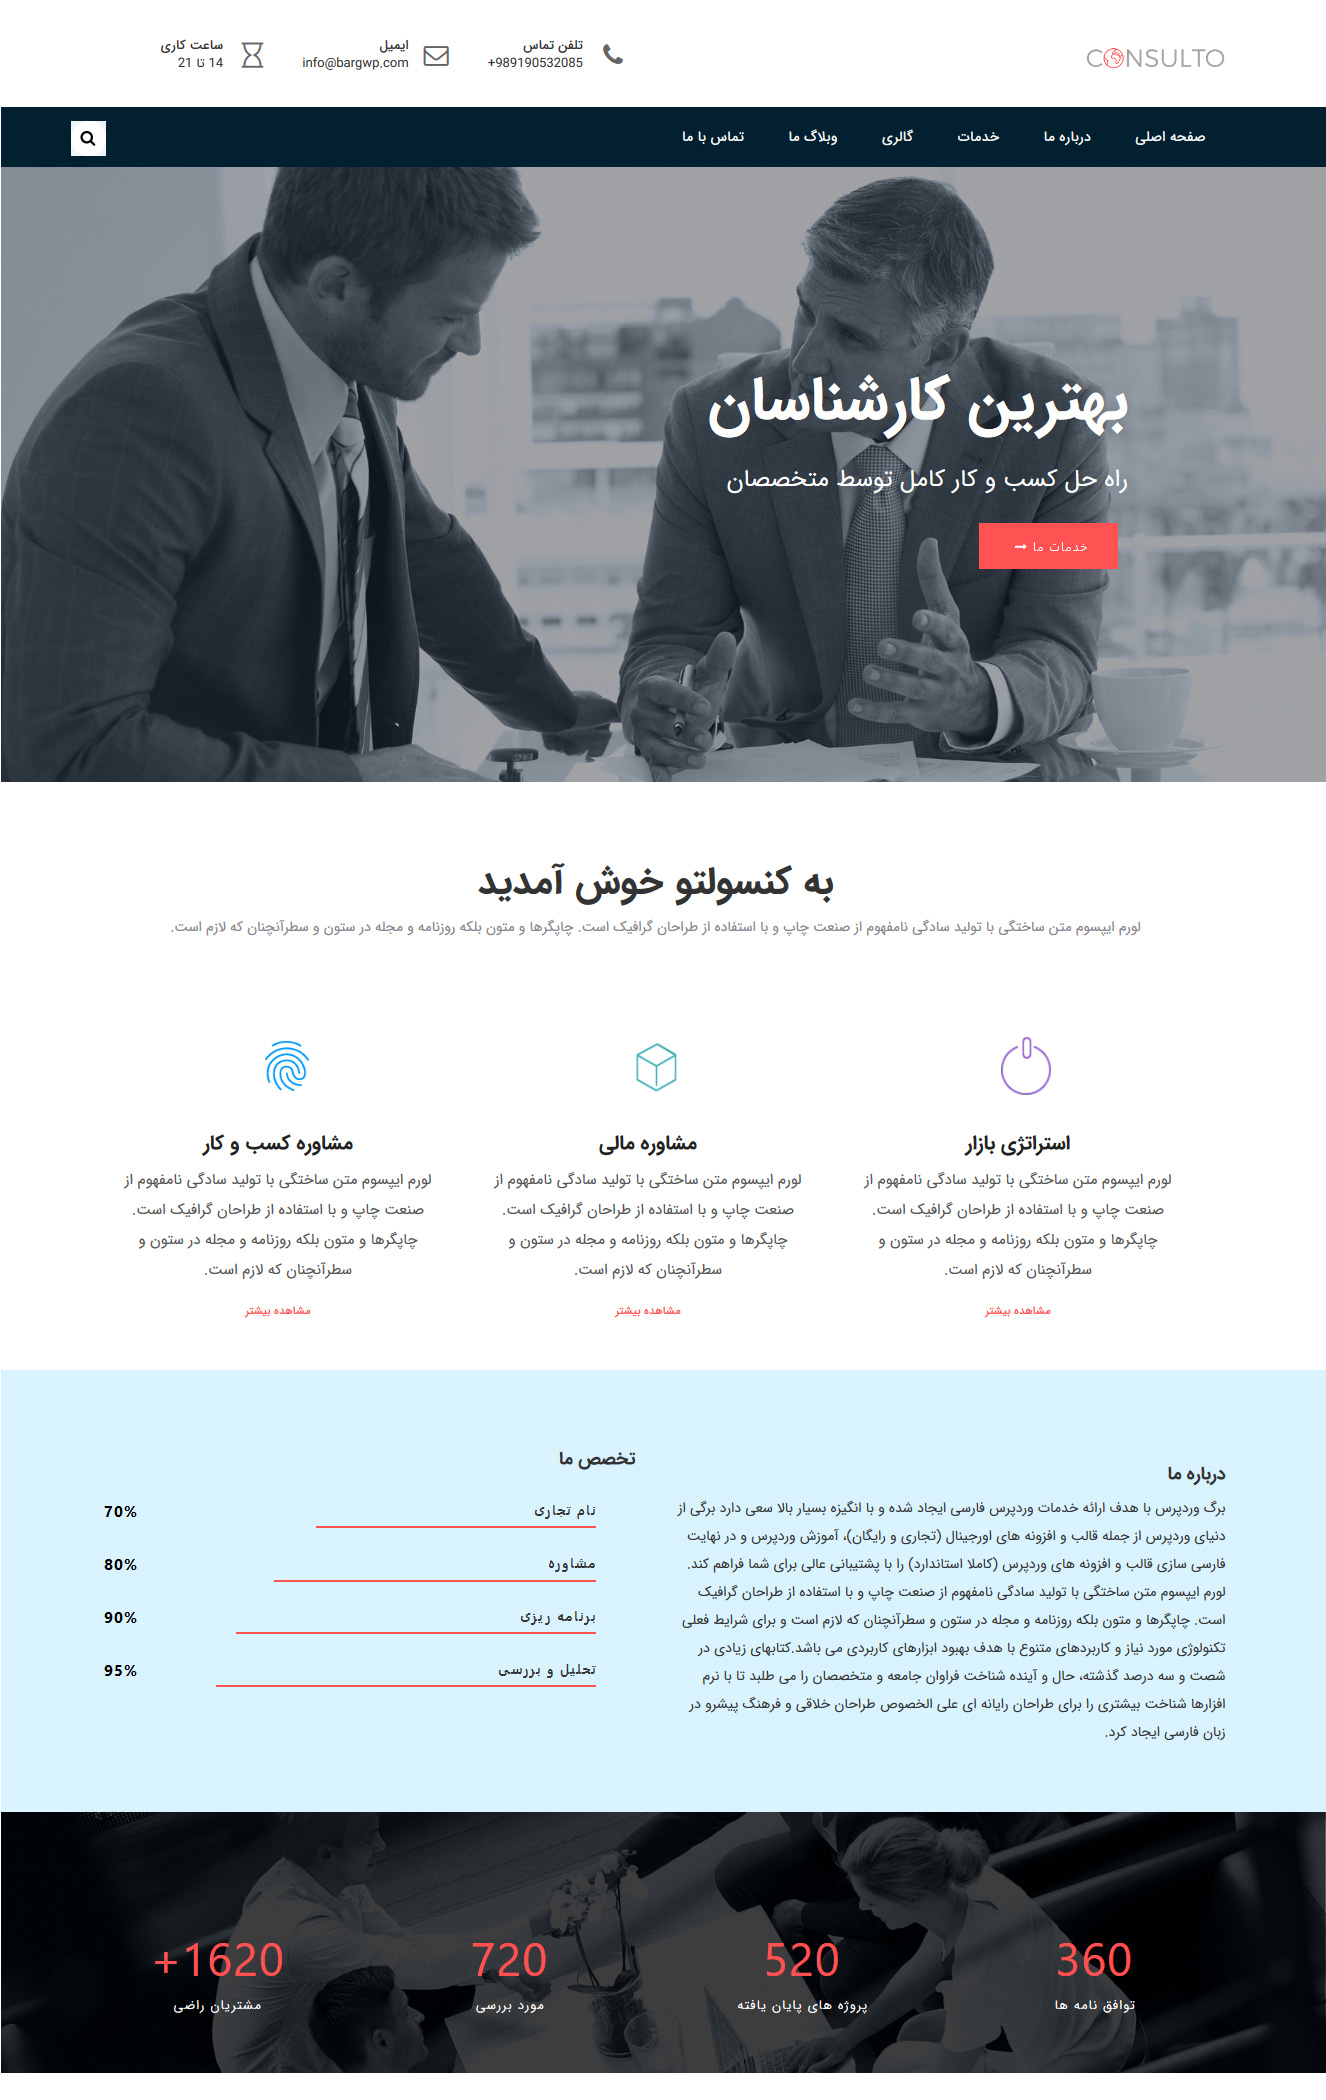 consulto 4 - پوسته فارسی شرکتی و تجاری وردپرس Consulto